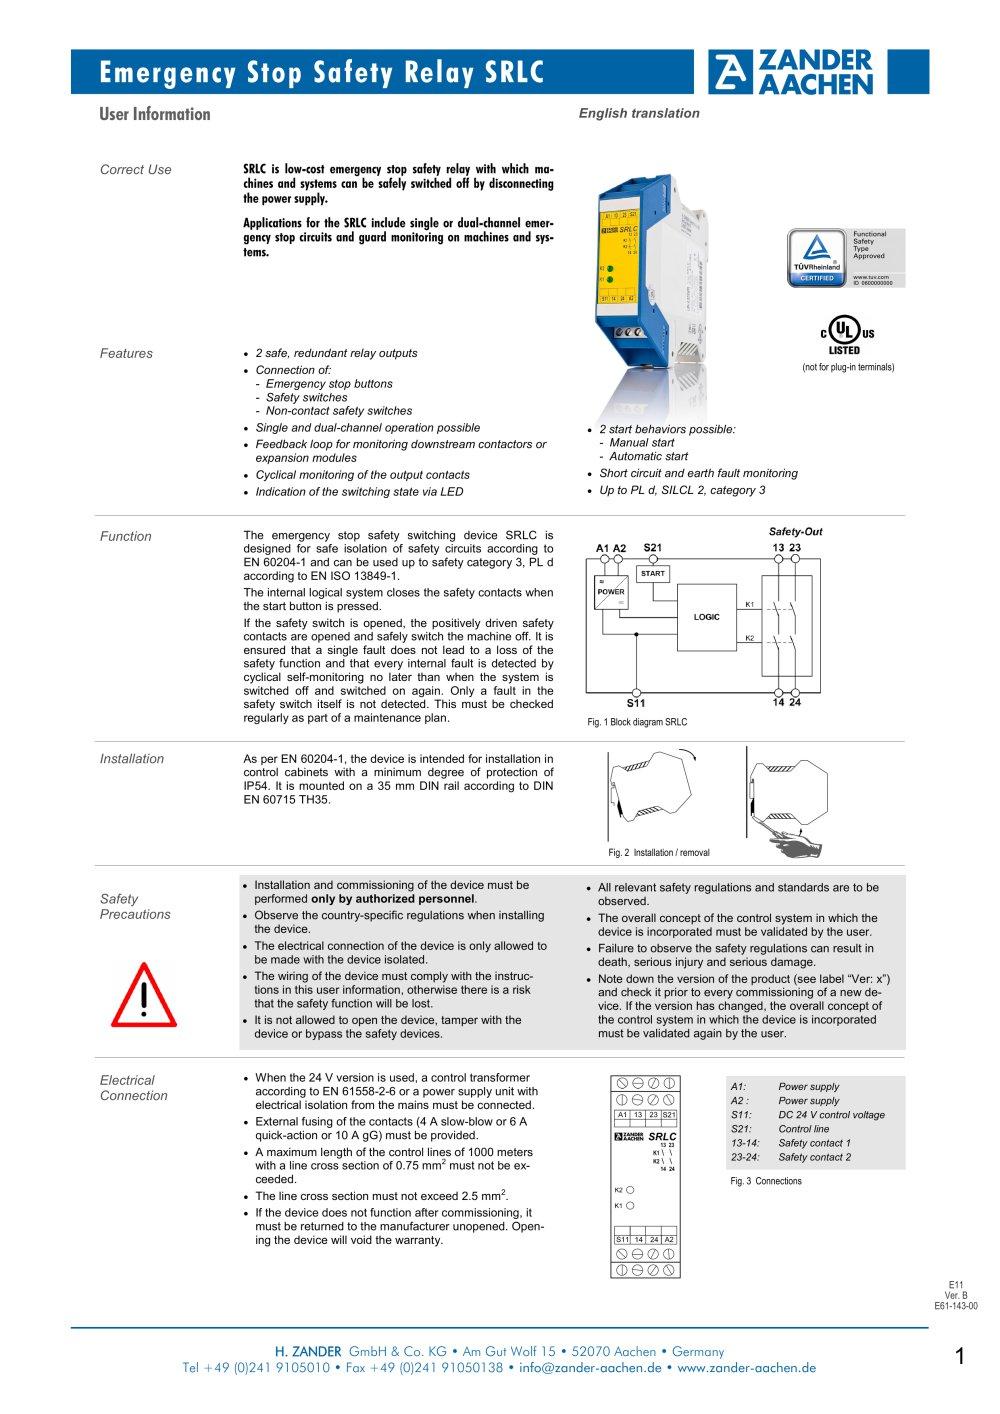 Monitoring Safety Relay Wiring Diagram Schematic Diagrams Switch Srlc Zander Gmbh Co Kg Hermann Pdf Catalogue Pump Pressure